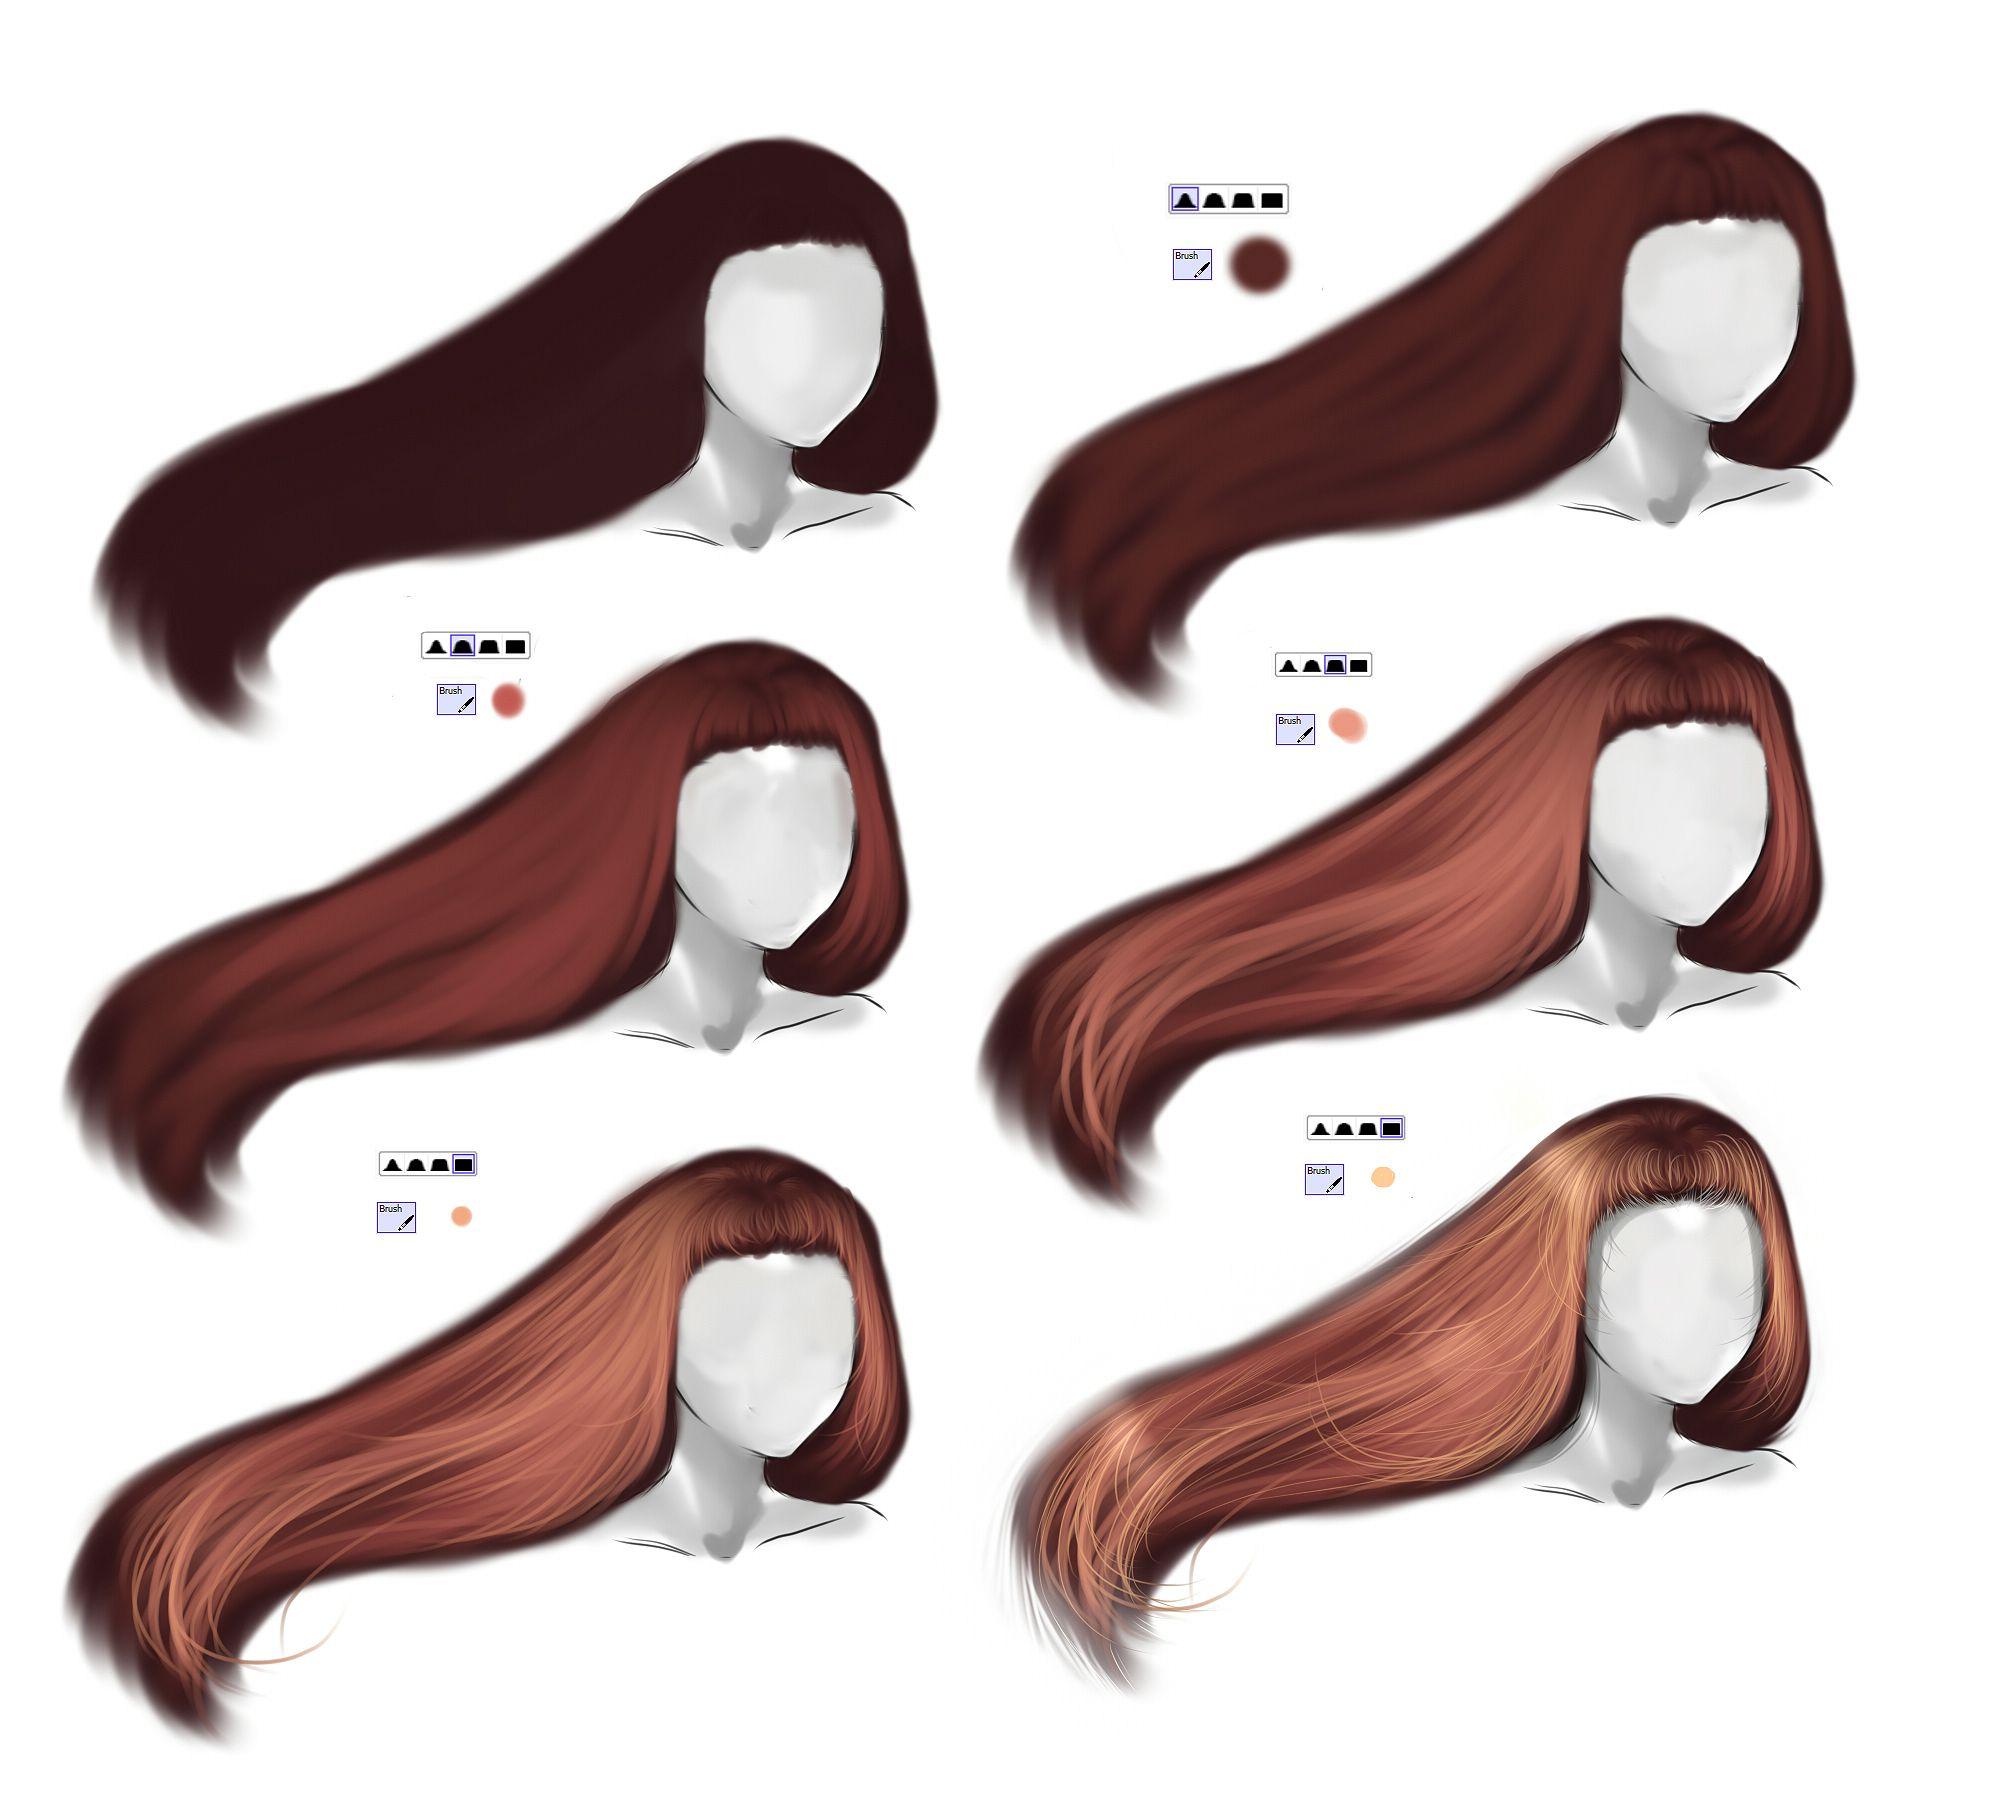 Hair Tutorial By Ryky On Deviantart Digital Painting Tutorials Digital Art Tutorial Hair Tutorial